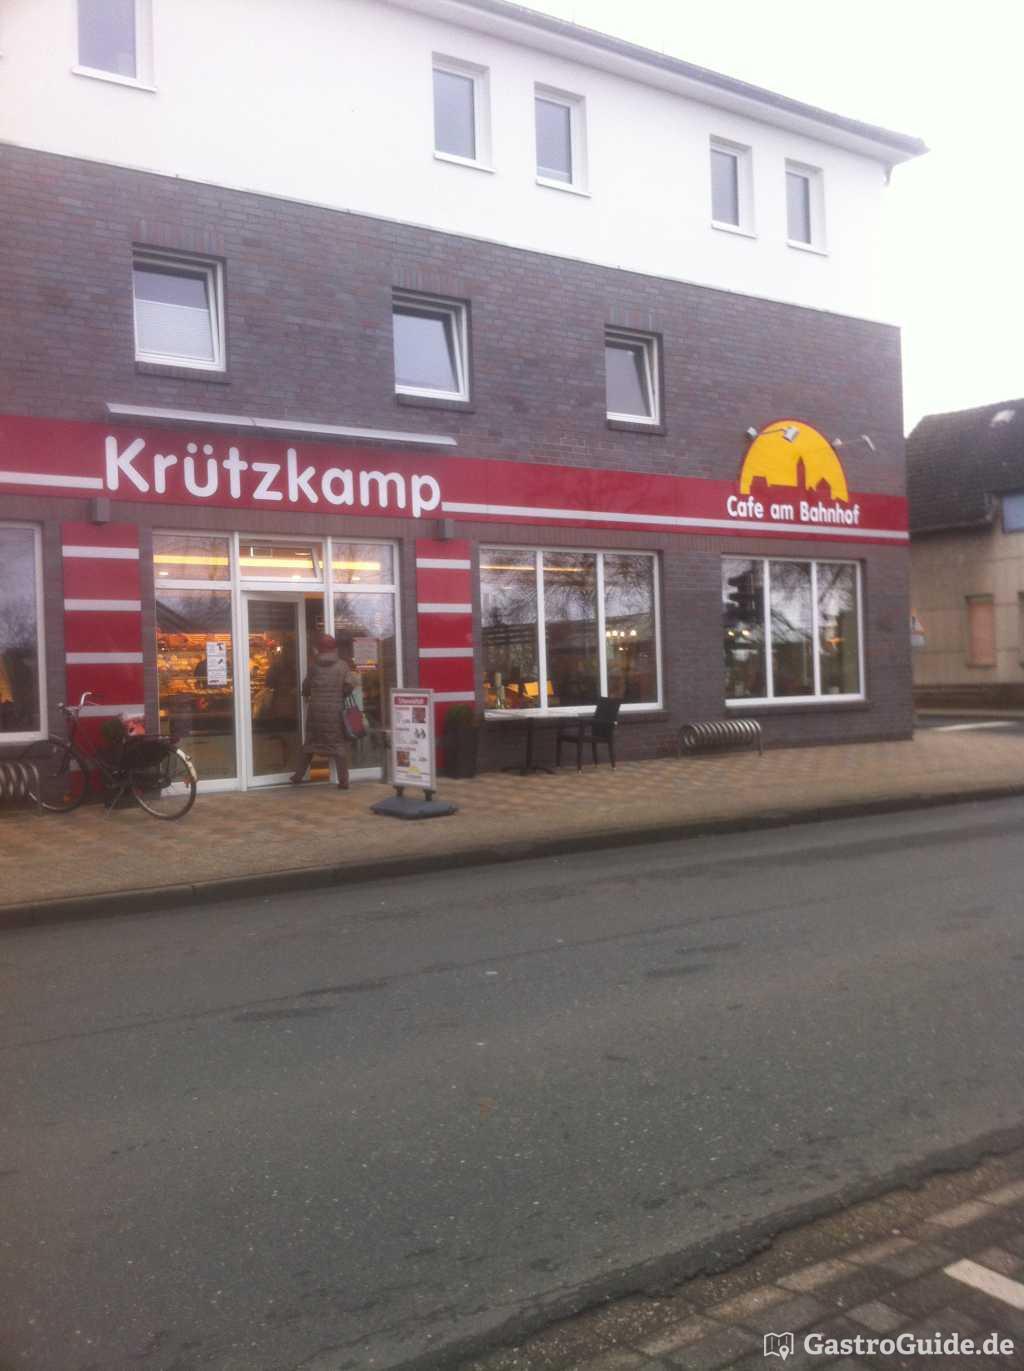 Bckerei Konditorei Krtzkamp  Caf am Bahnhof Bckerei Cafe in 27798 Hude Oldenburg